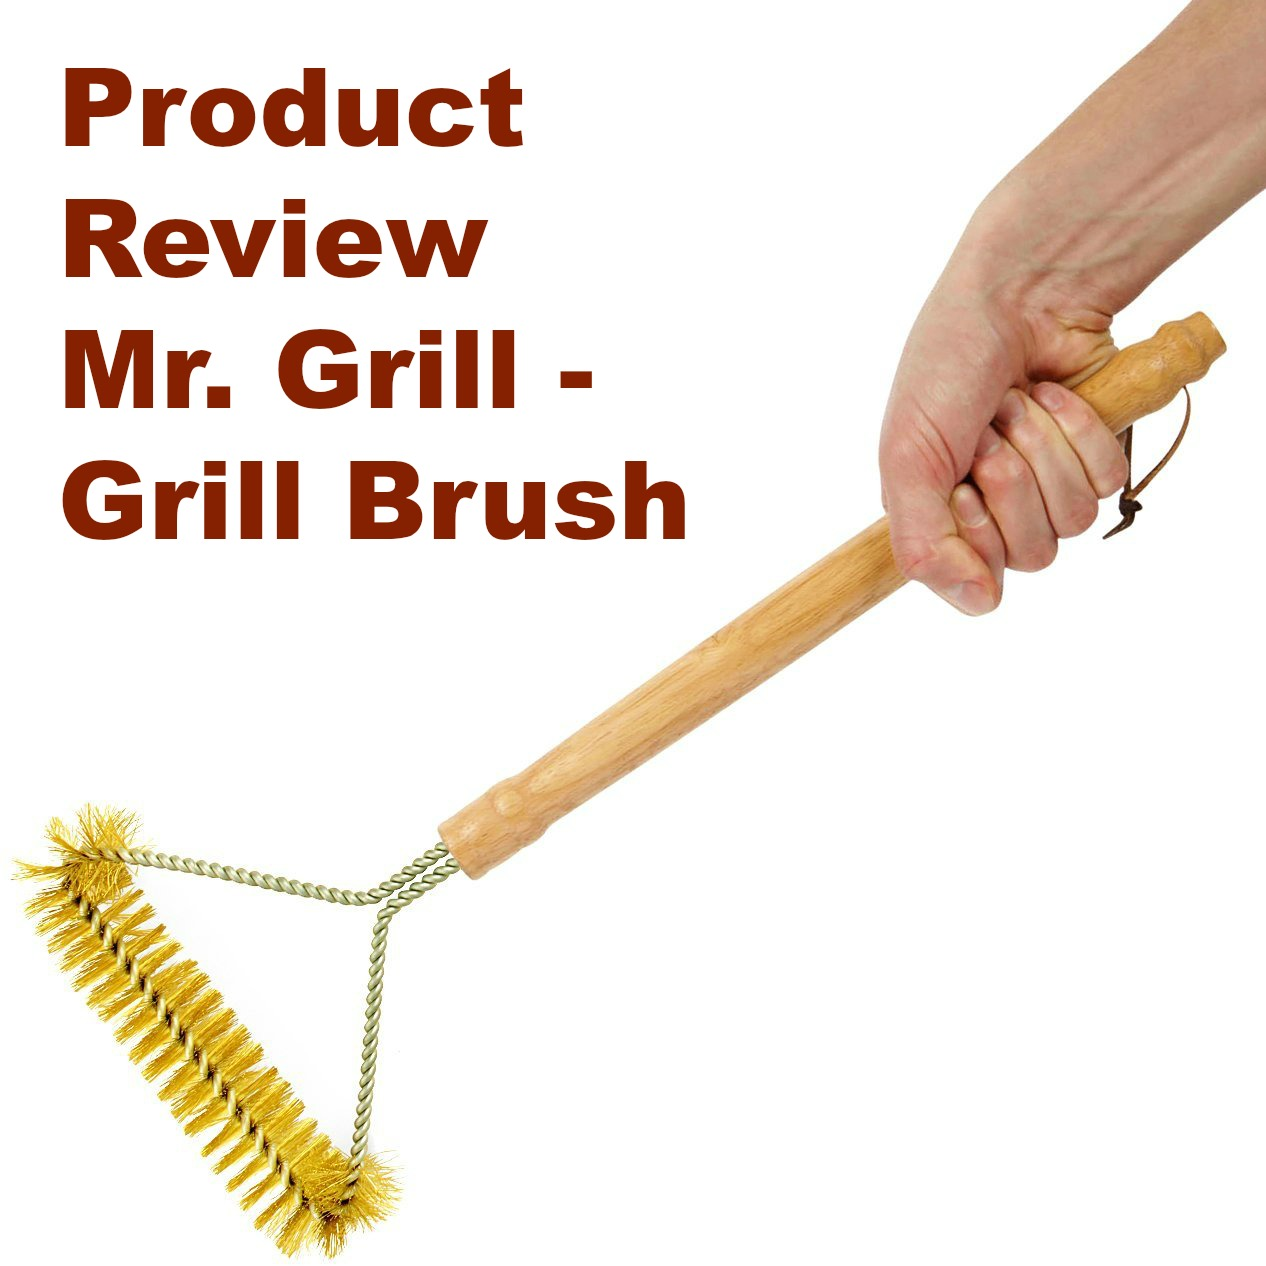 Mr Grill Brush